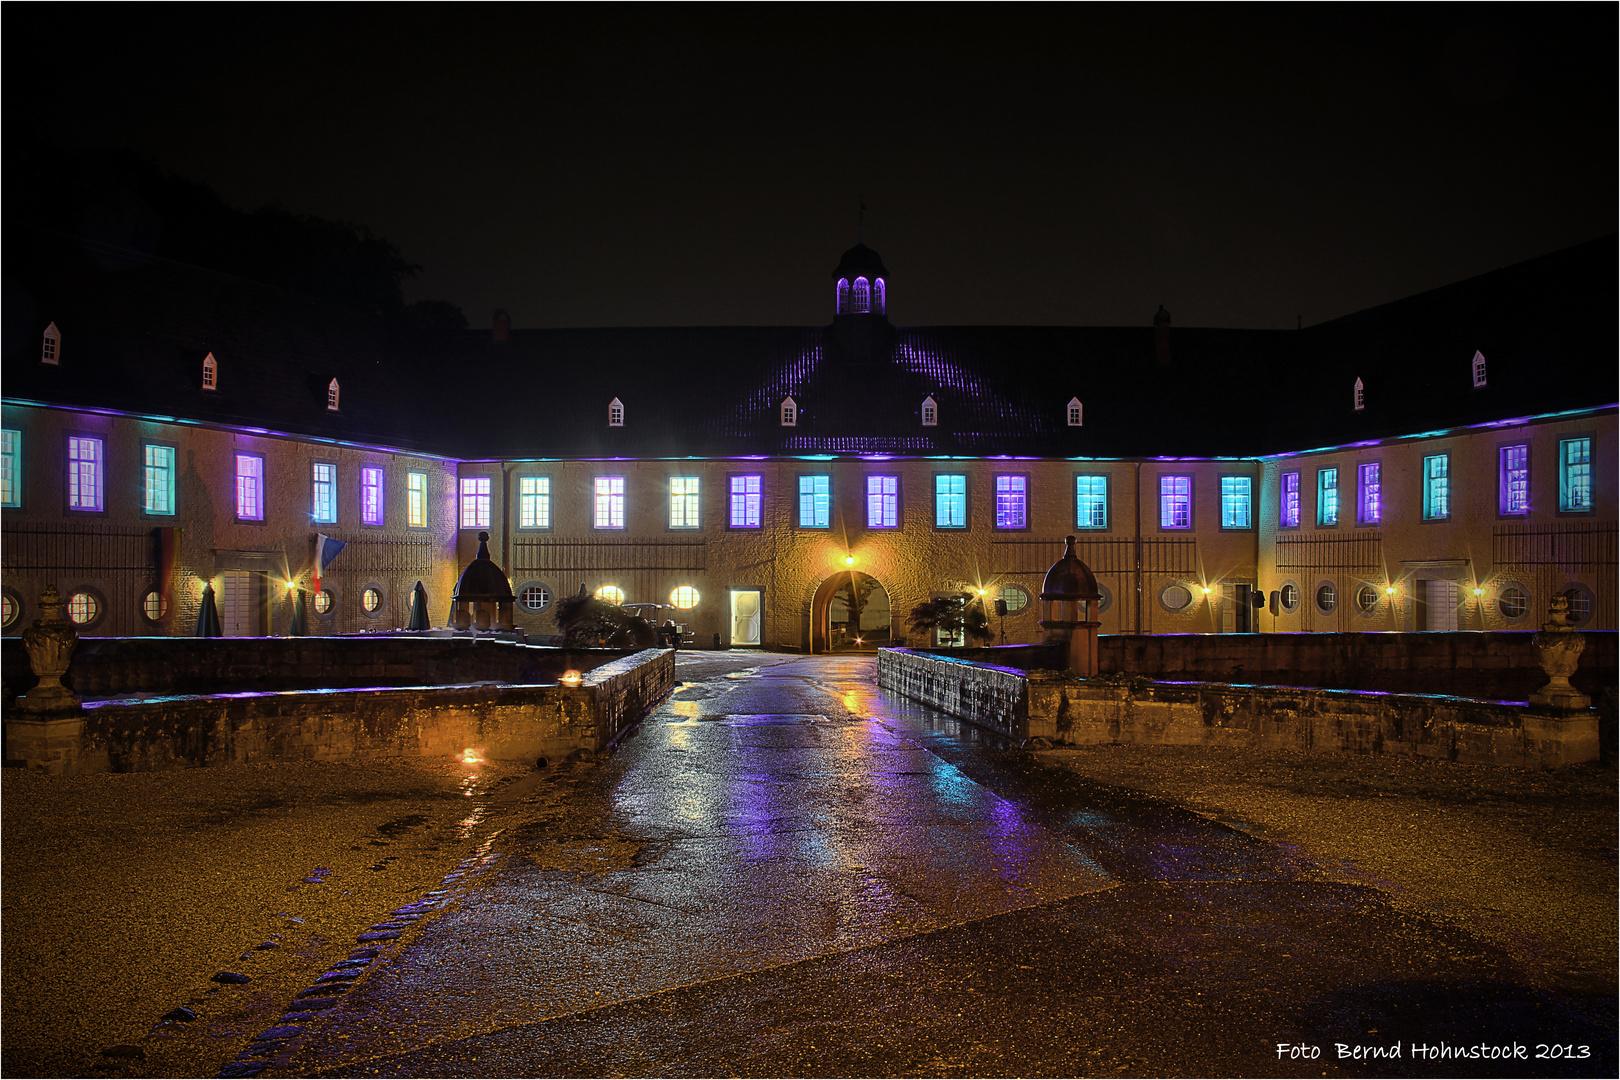 Schloß Dyck Illumina 10.0 ... 2013